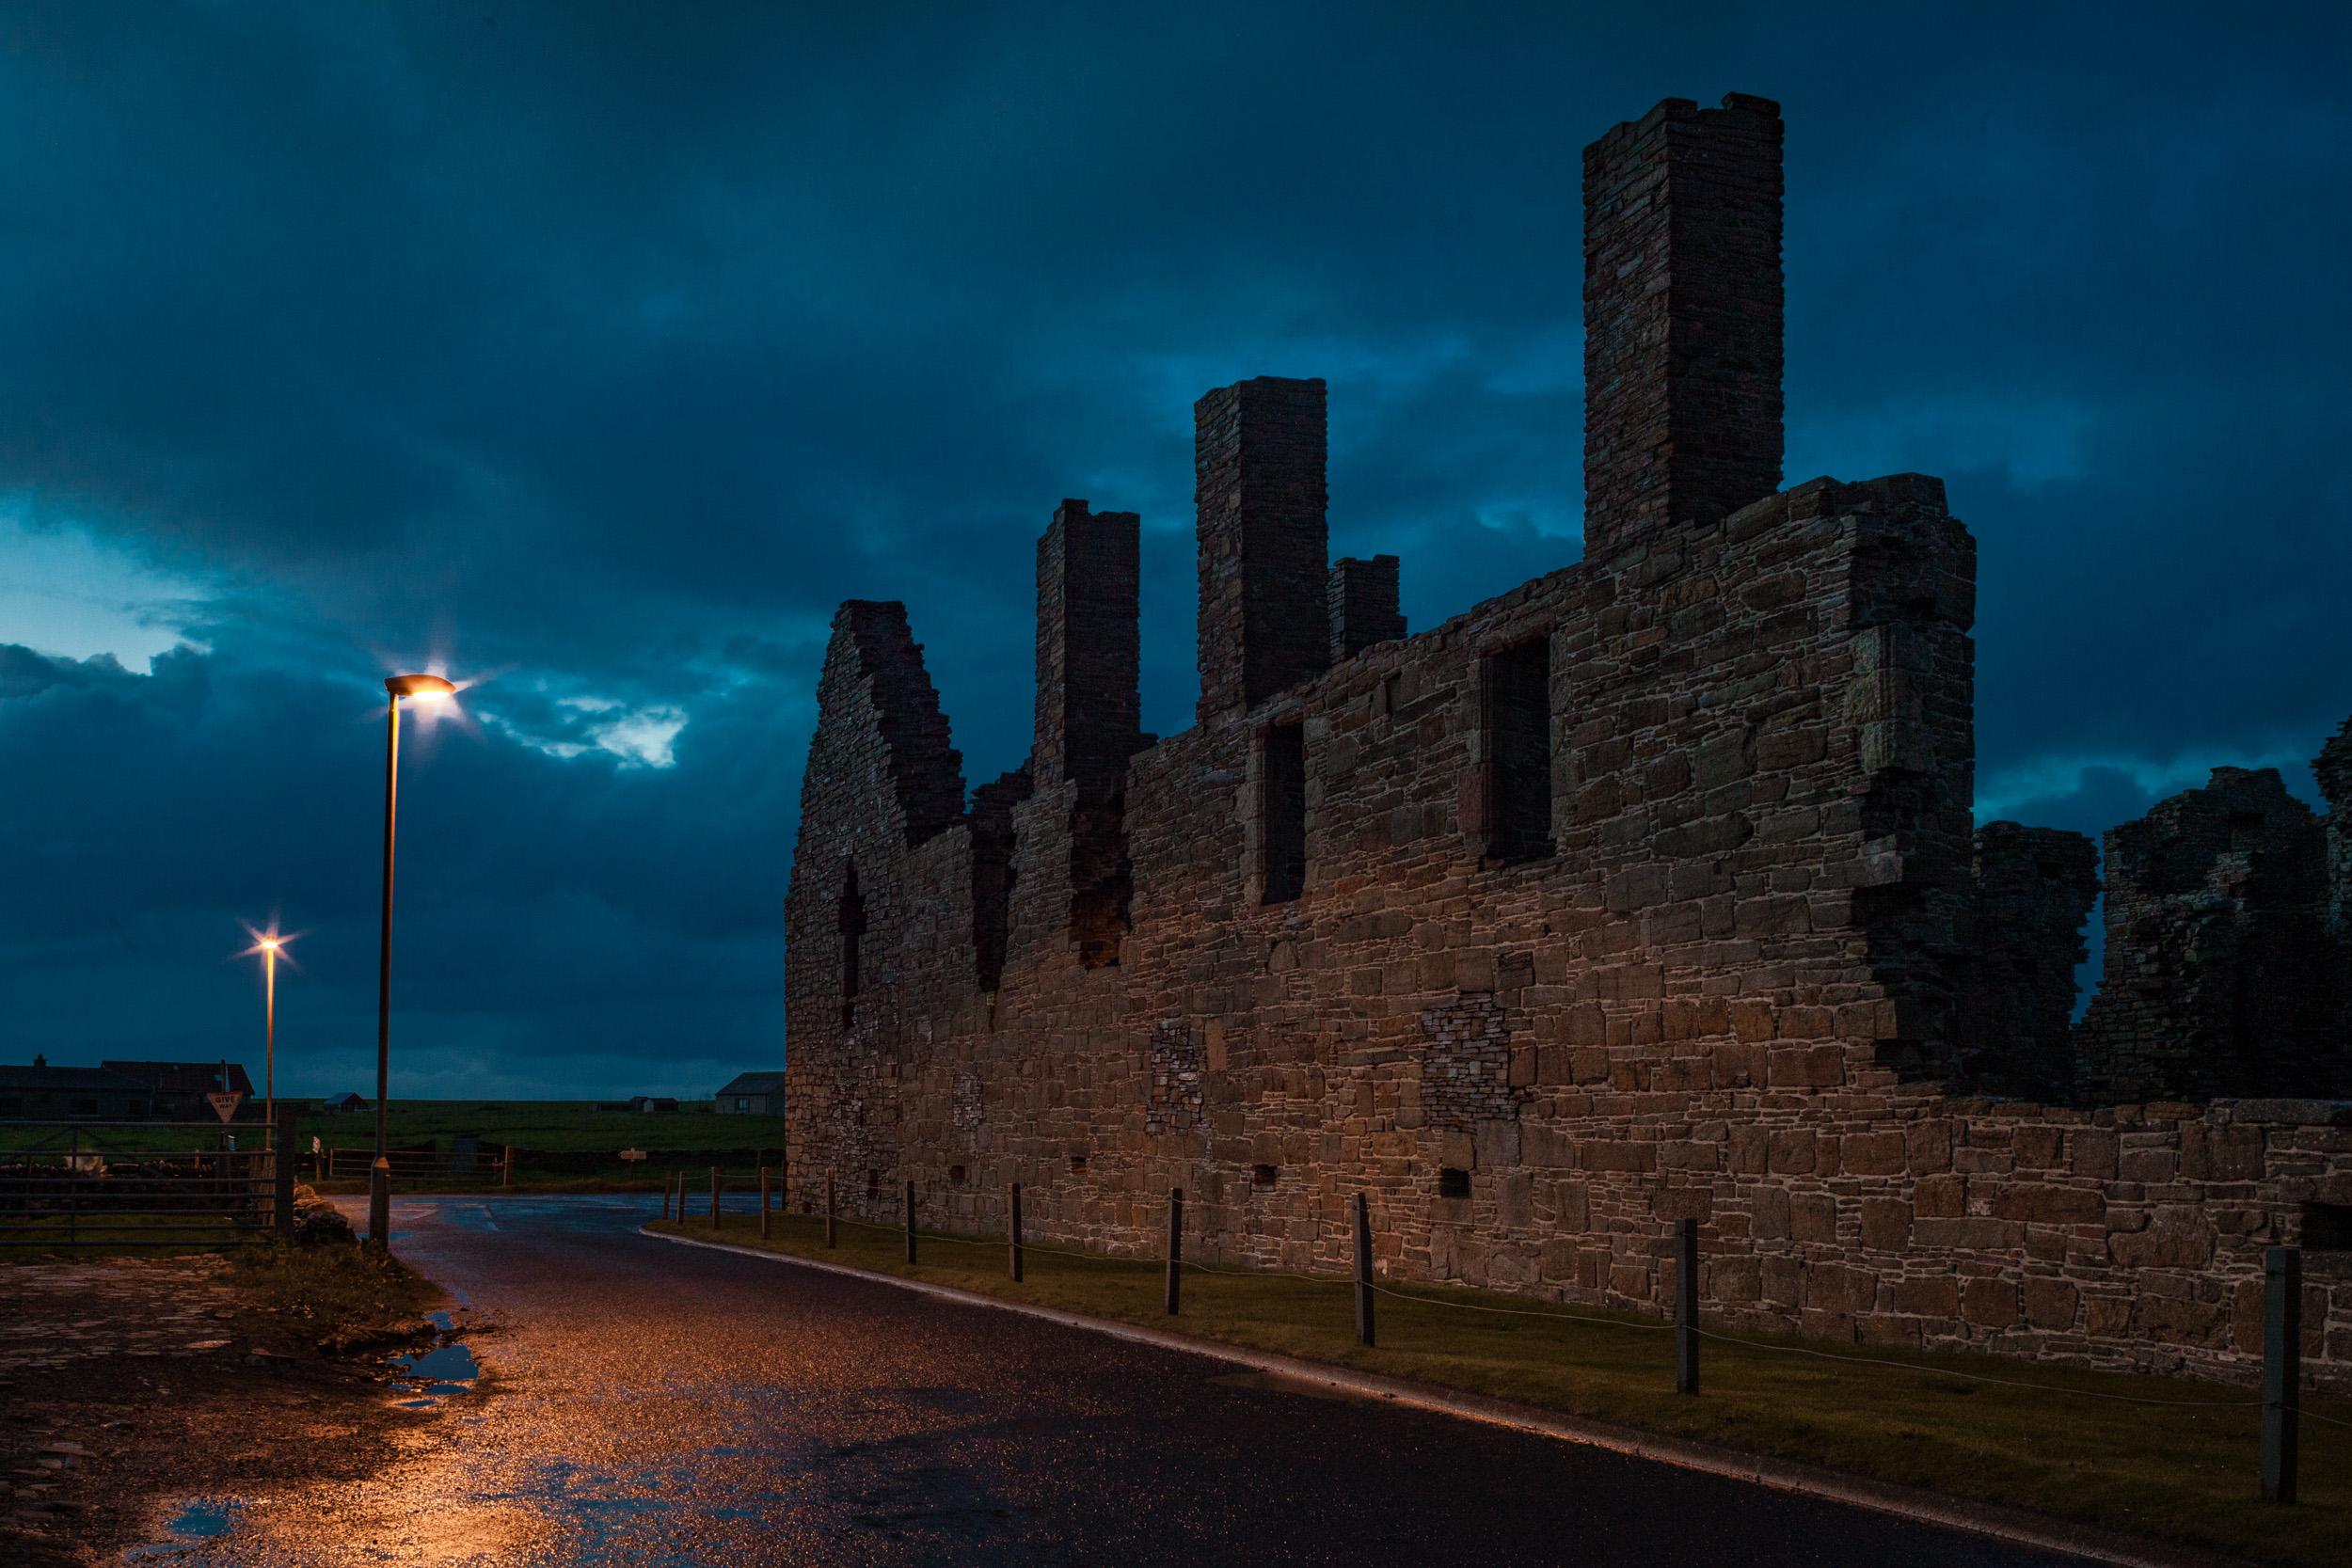 4. Birsay, Orkney, Scotland.